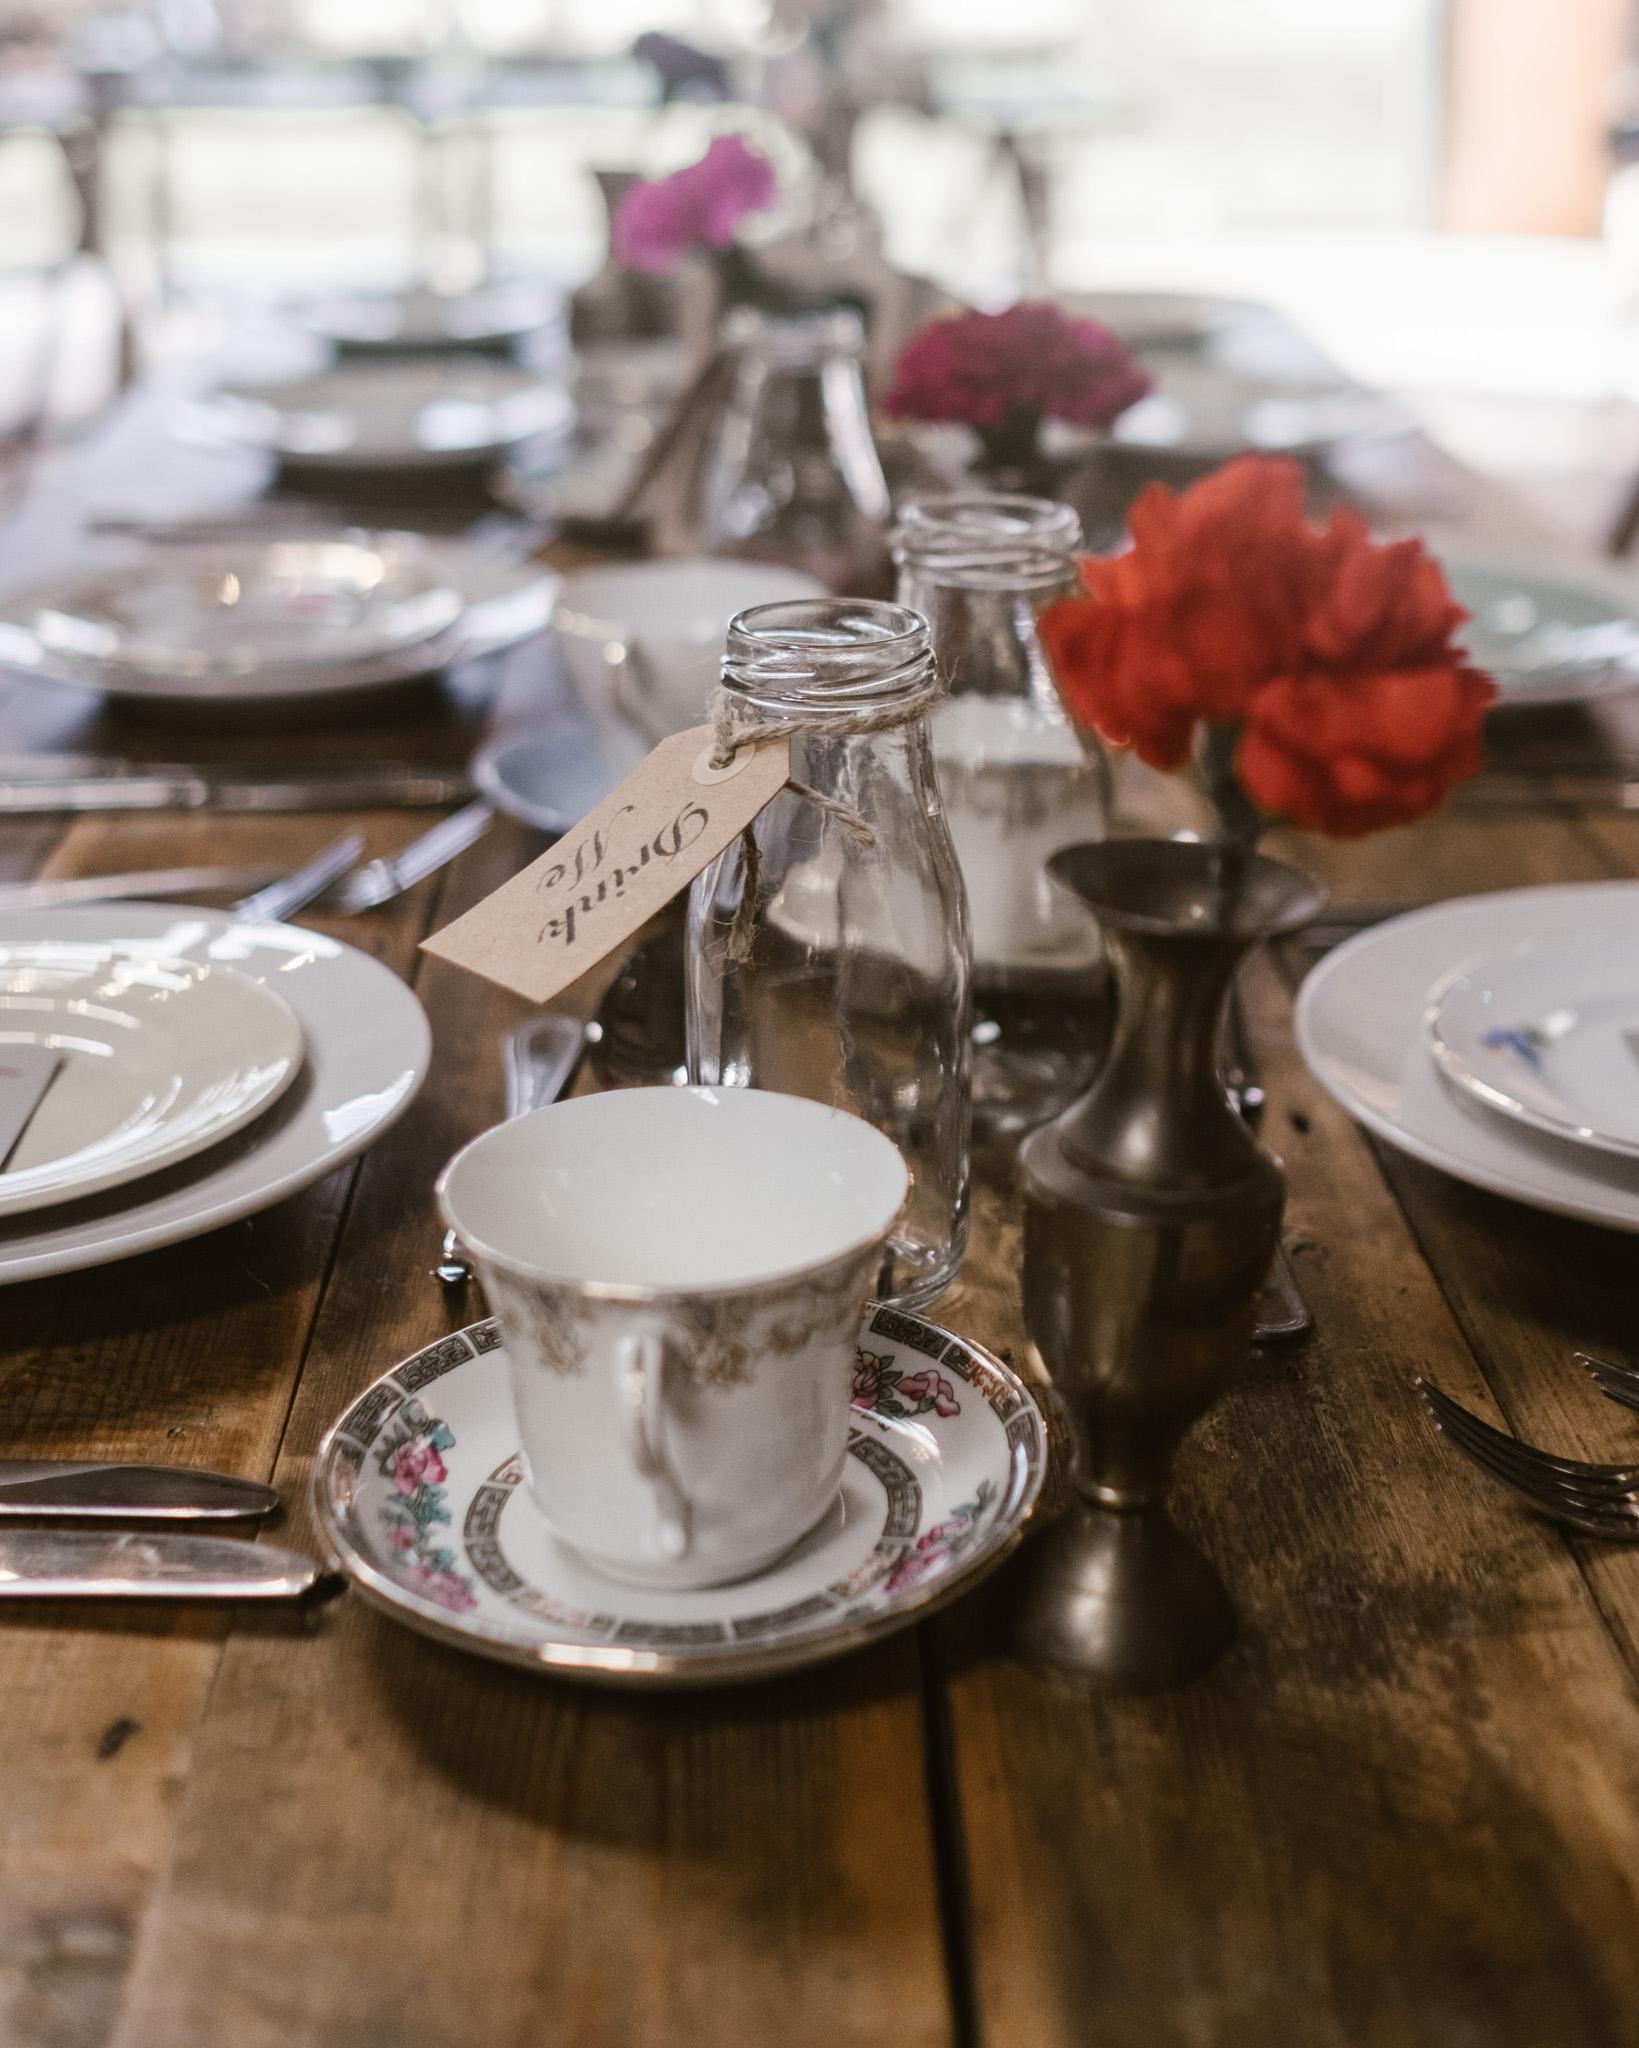 Captains-Wood-Barn-Alterative-Rustic-Vintage-Essex-Wedding-Suffolk-Grace-Elizabeth-56.jpg